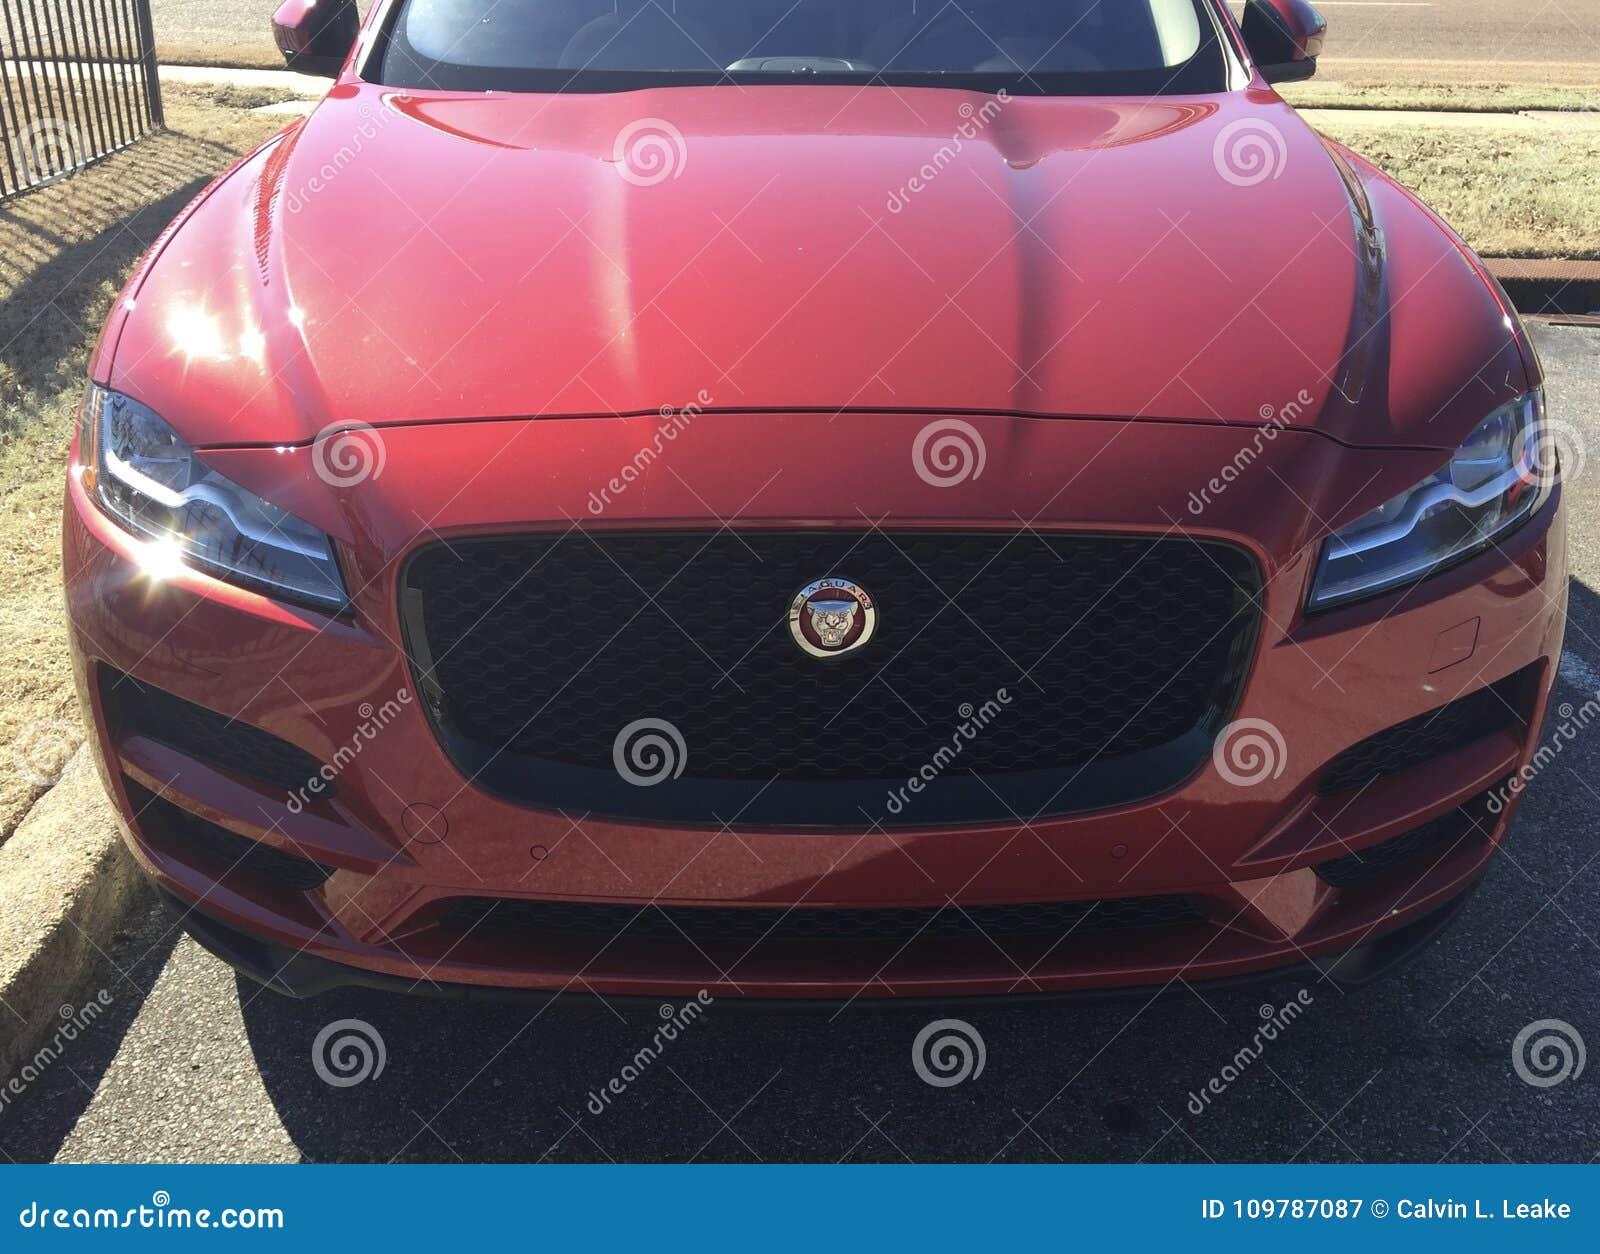 Jaguar British Motor Cars Suv Editorial Photography Image Of